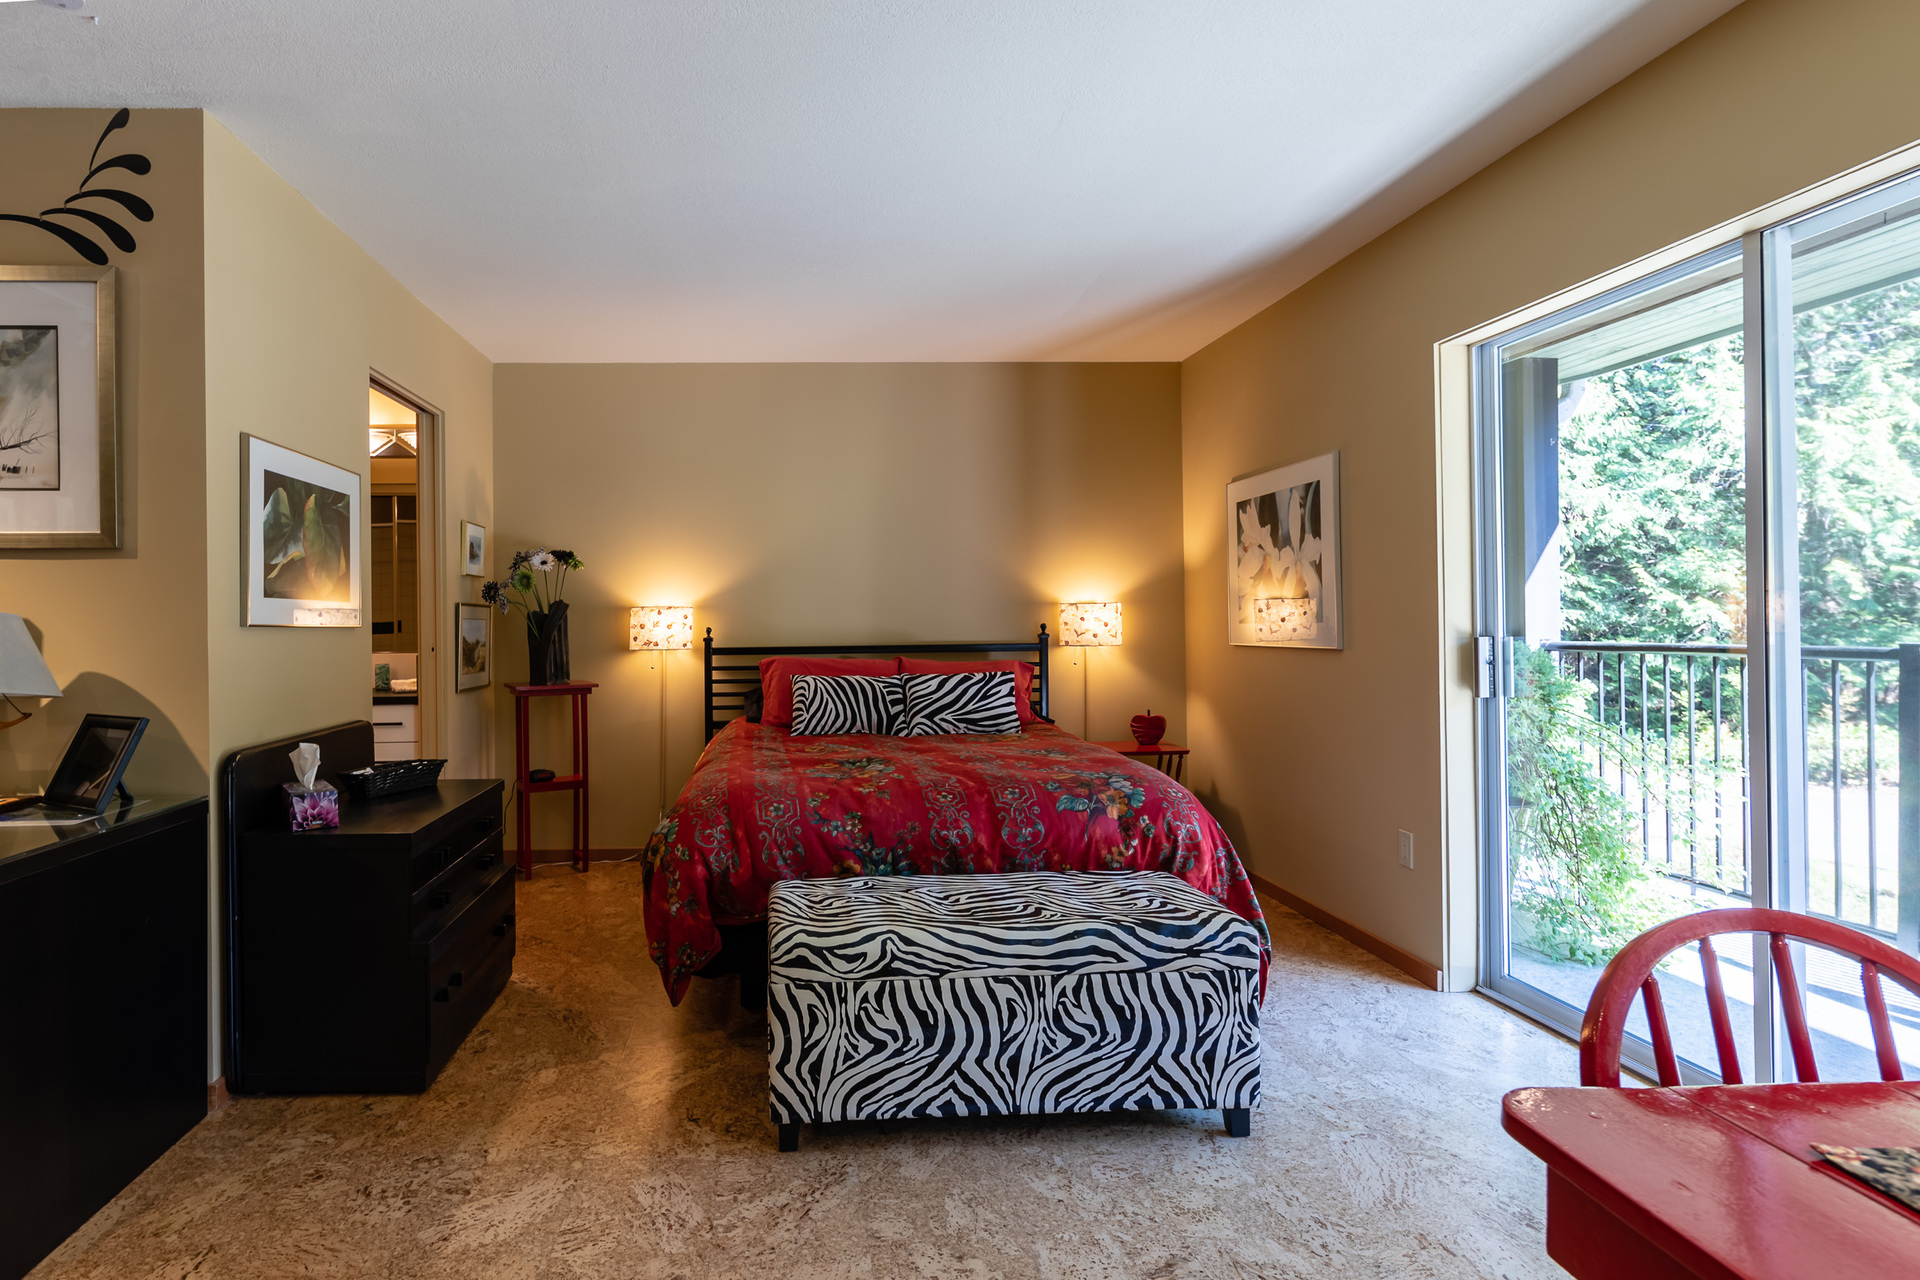 Second Master Suite Guest Bedroom at 5101 Island Highway West, Qualicum Beach, Zone 05 - Parksville/Qualicum